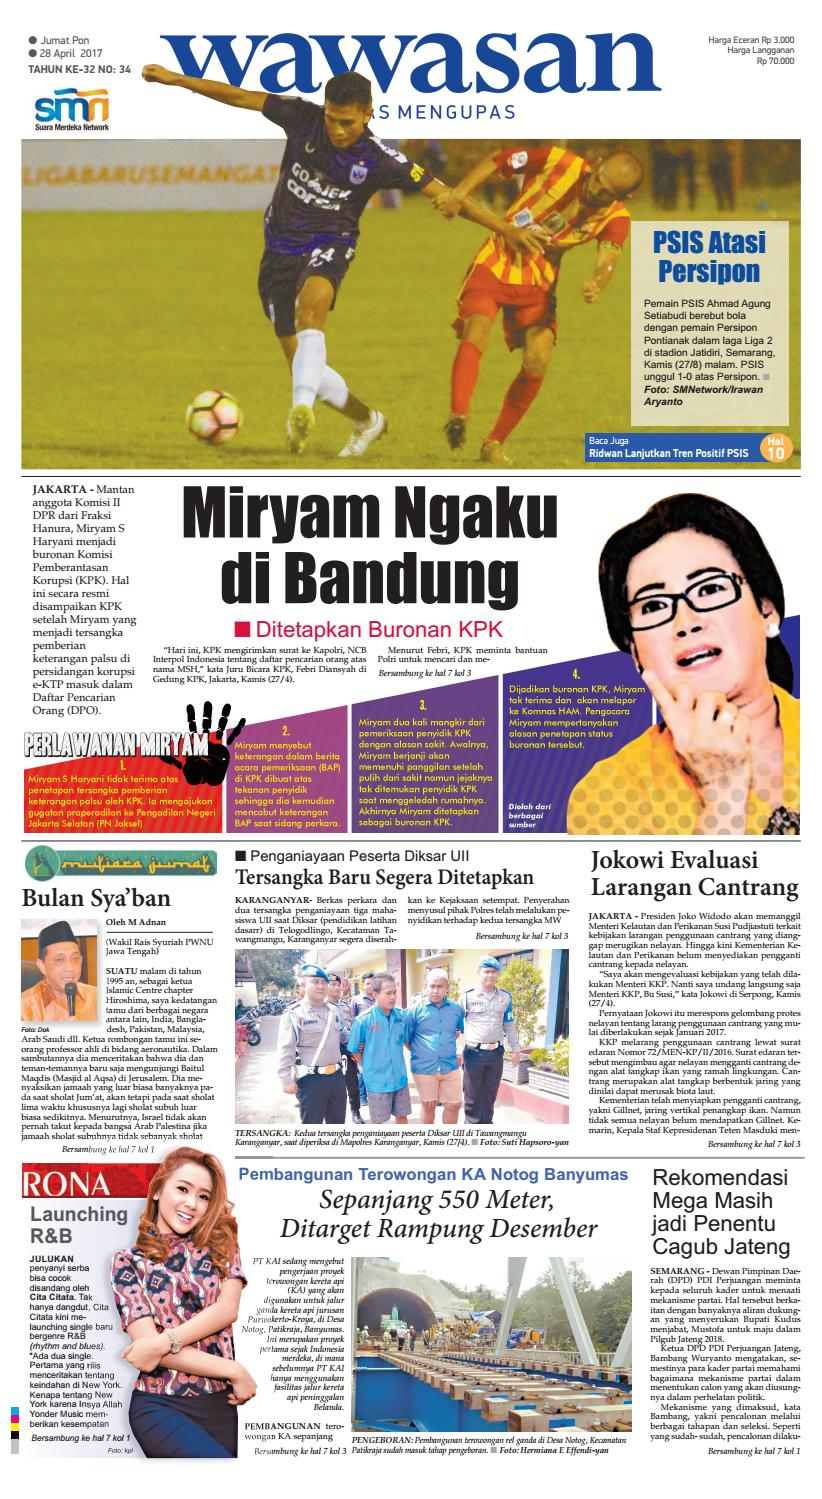 Wawasan 28 April 2017 By Koran Pagi Issuu Produk Ukm Bumn Dress Gamis Batik Motif Ayam Bekisar